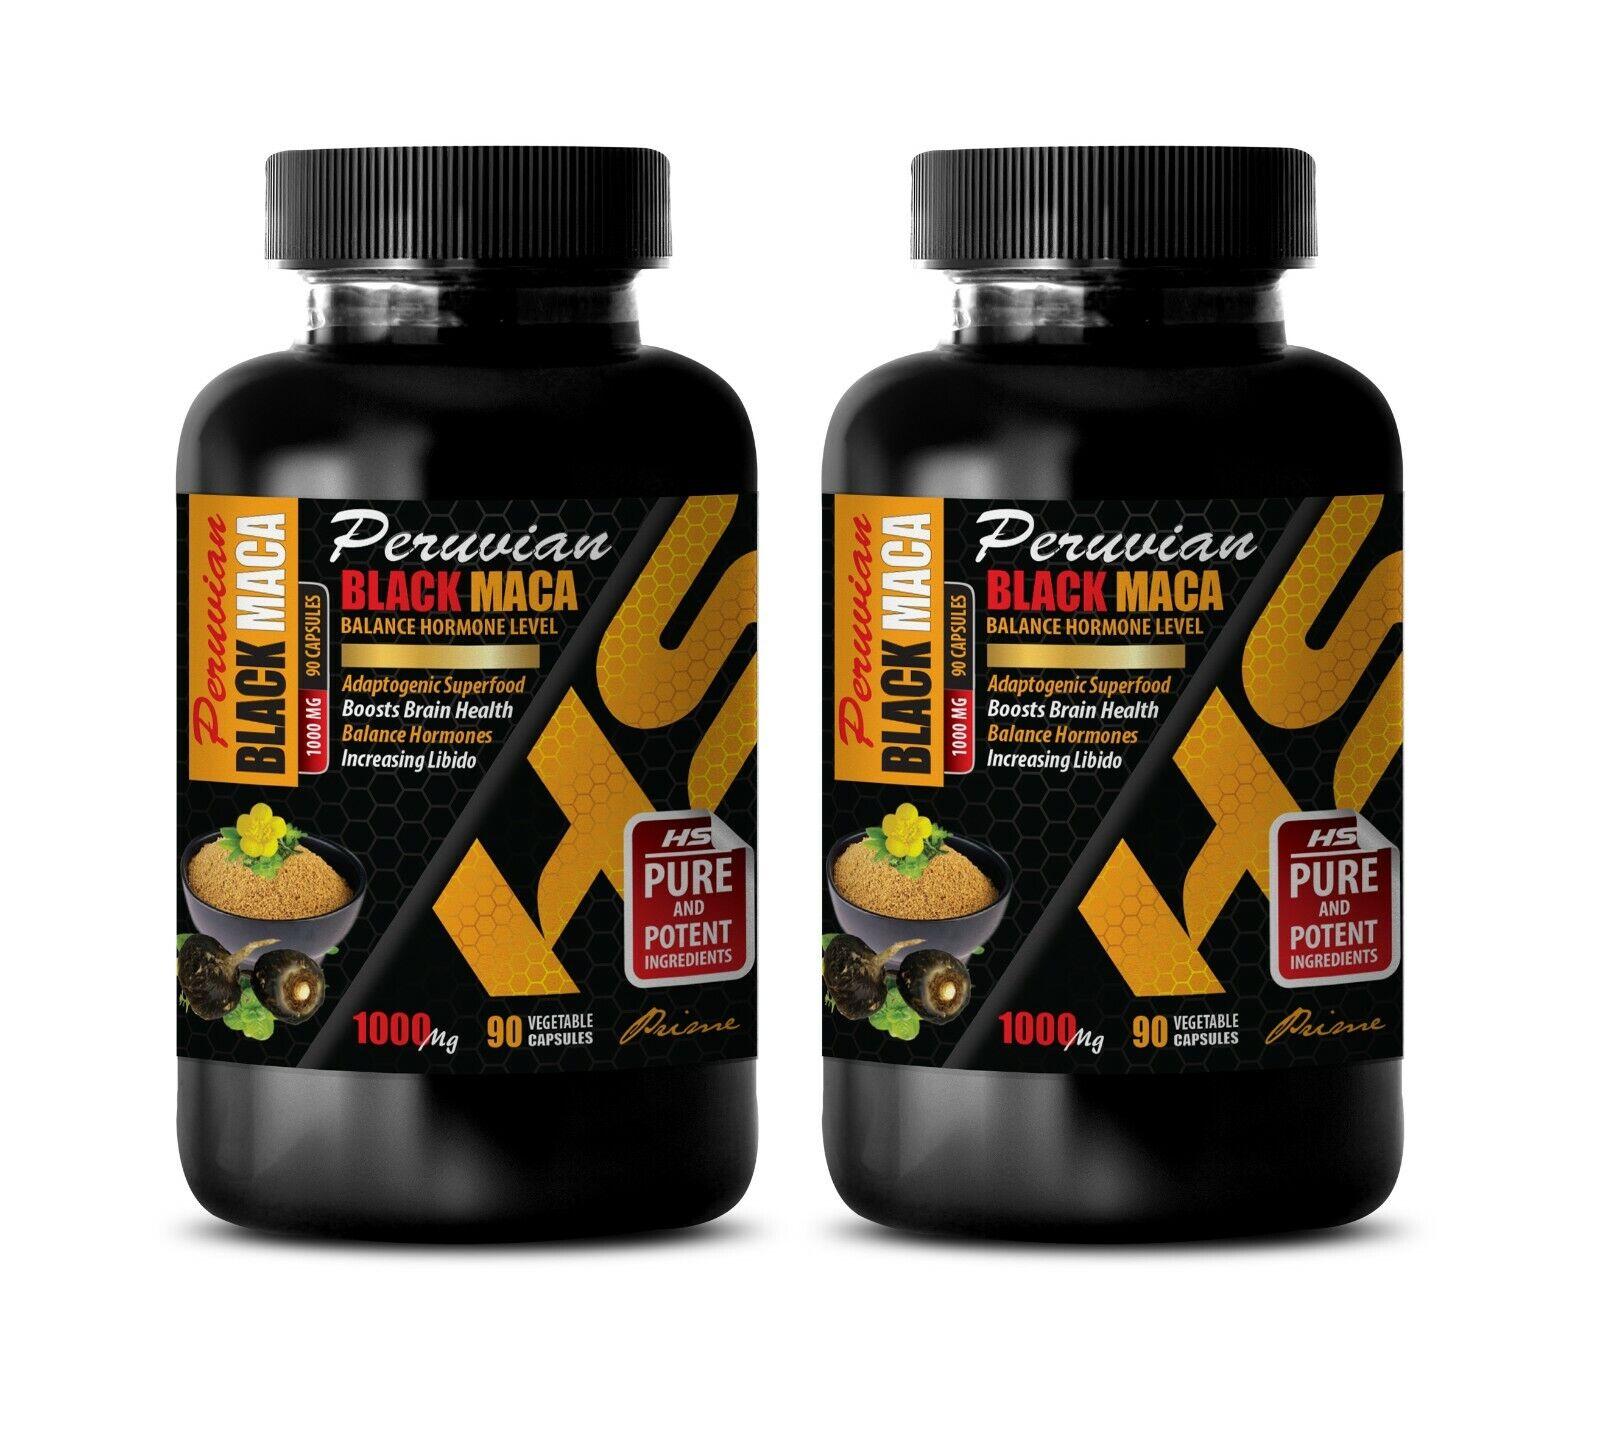 boost energy supplement - PERUVIAN BLACK MACA - black maca extract powder 2B